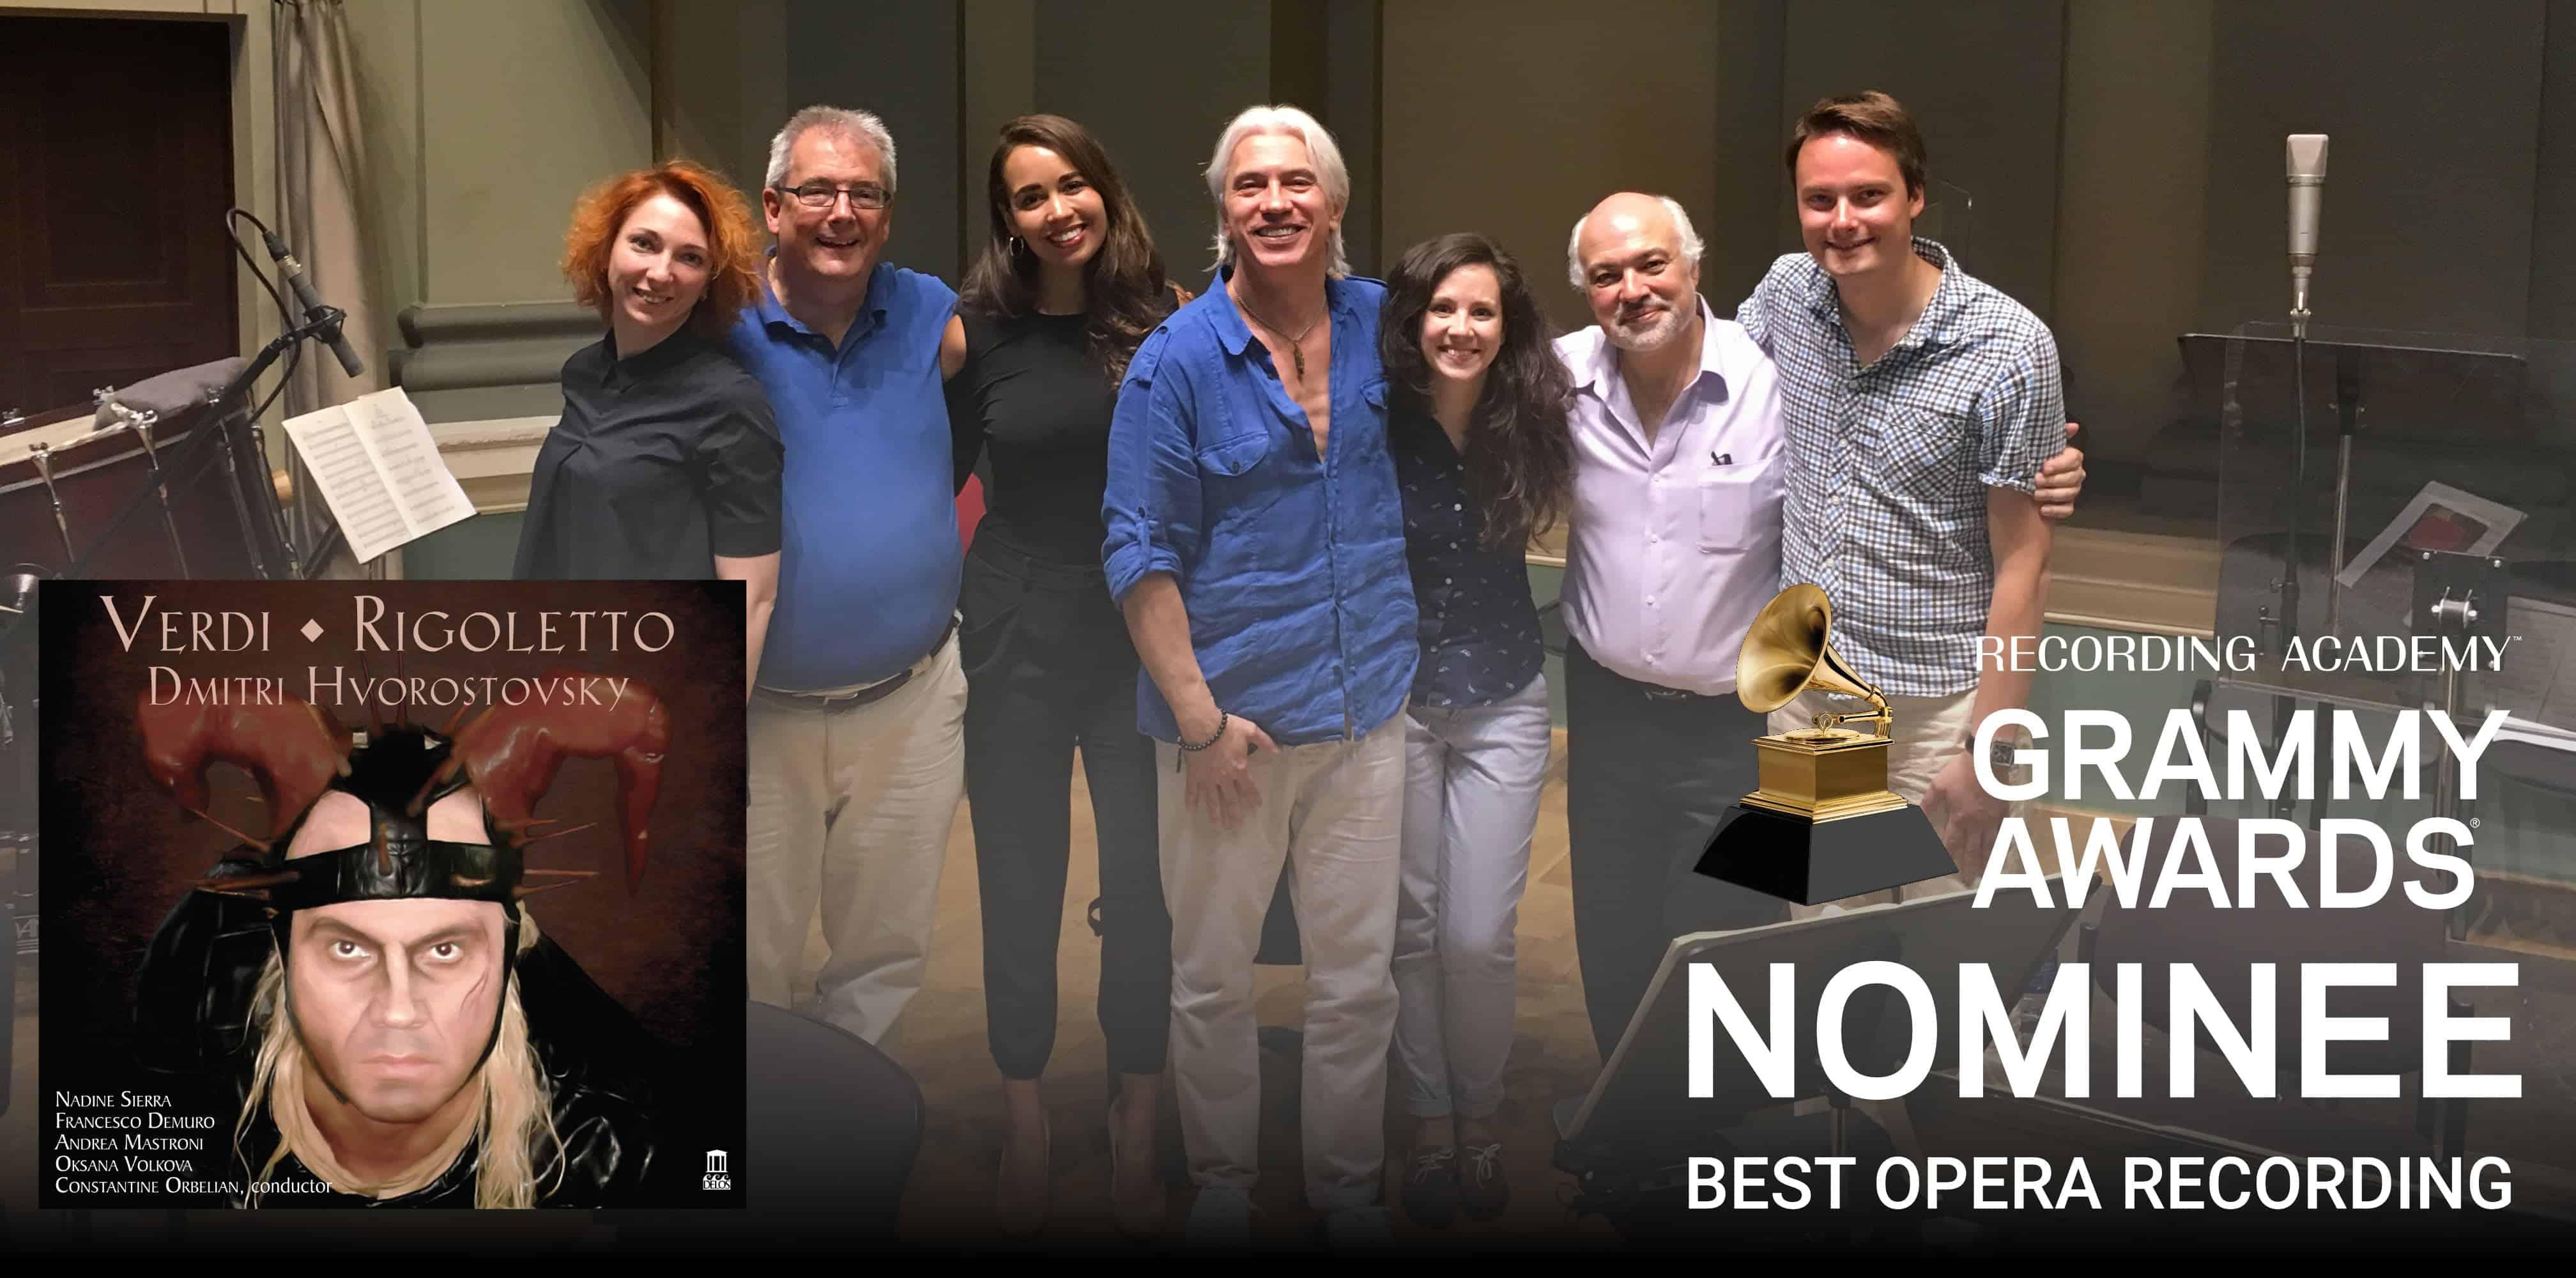 Verdi: Rigoletto - GRAMMY Nomination - Cover art with GRAMMY Nominee Sticker overlayed on recording session photo